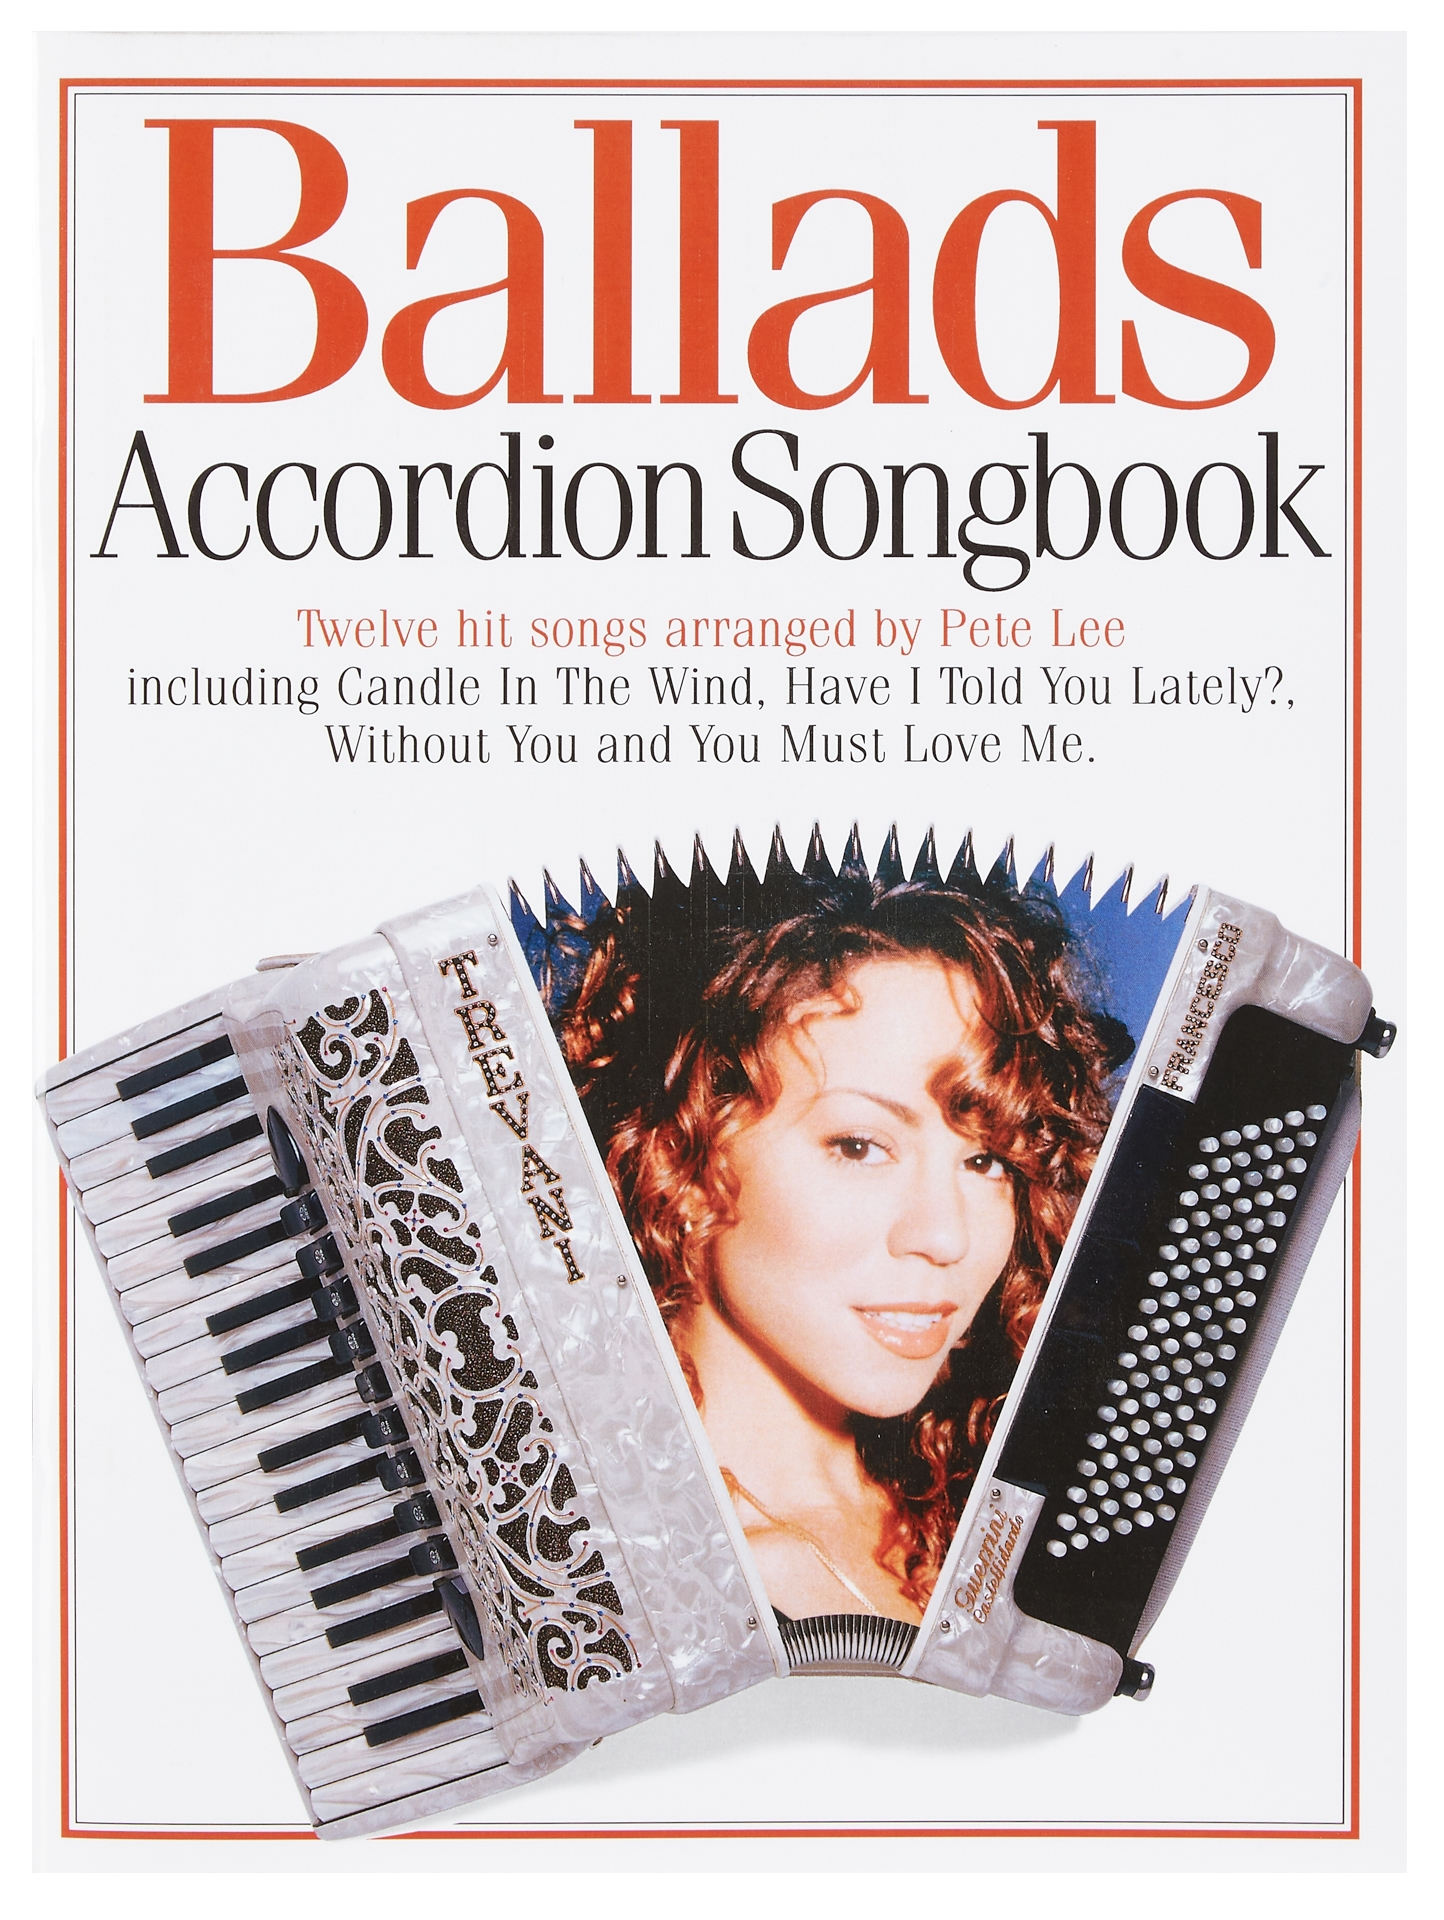 MS Accordion Songbook Ballads